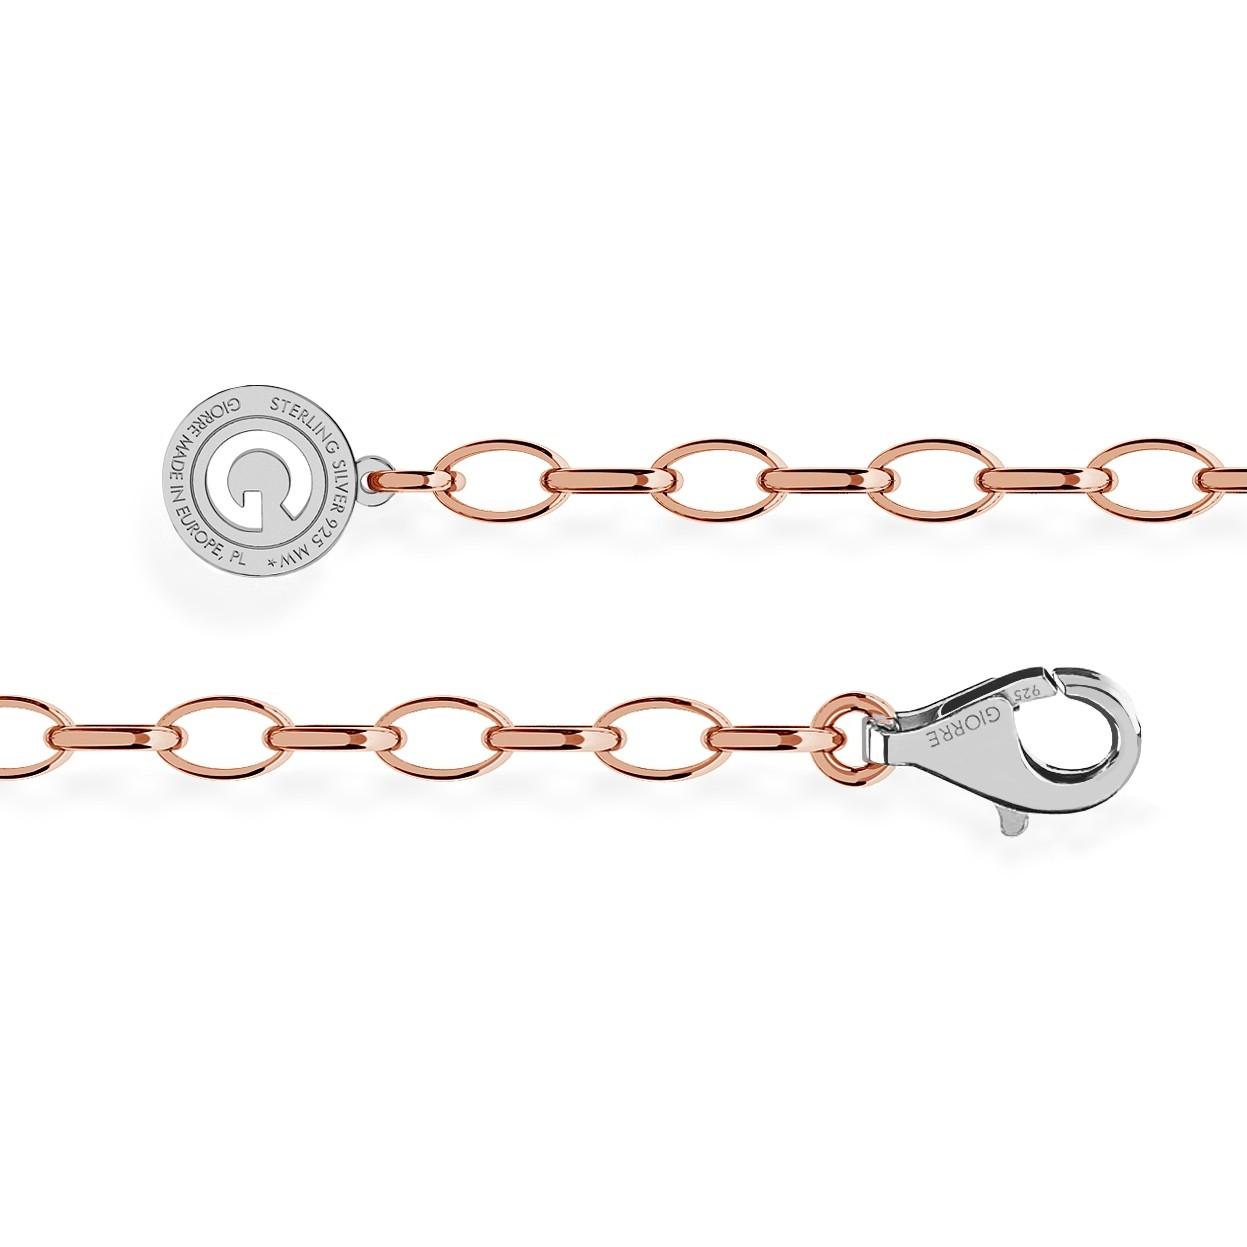 STERLING SILVER BRACELET 16-24 CM PINK GOLD, LIGHT RHODIUM CLASP, LINK 6X4 MM